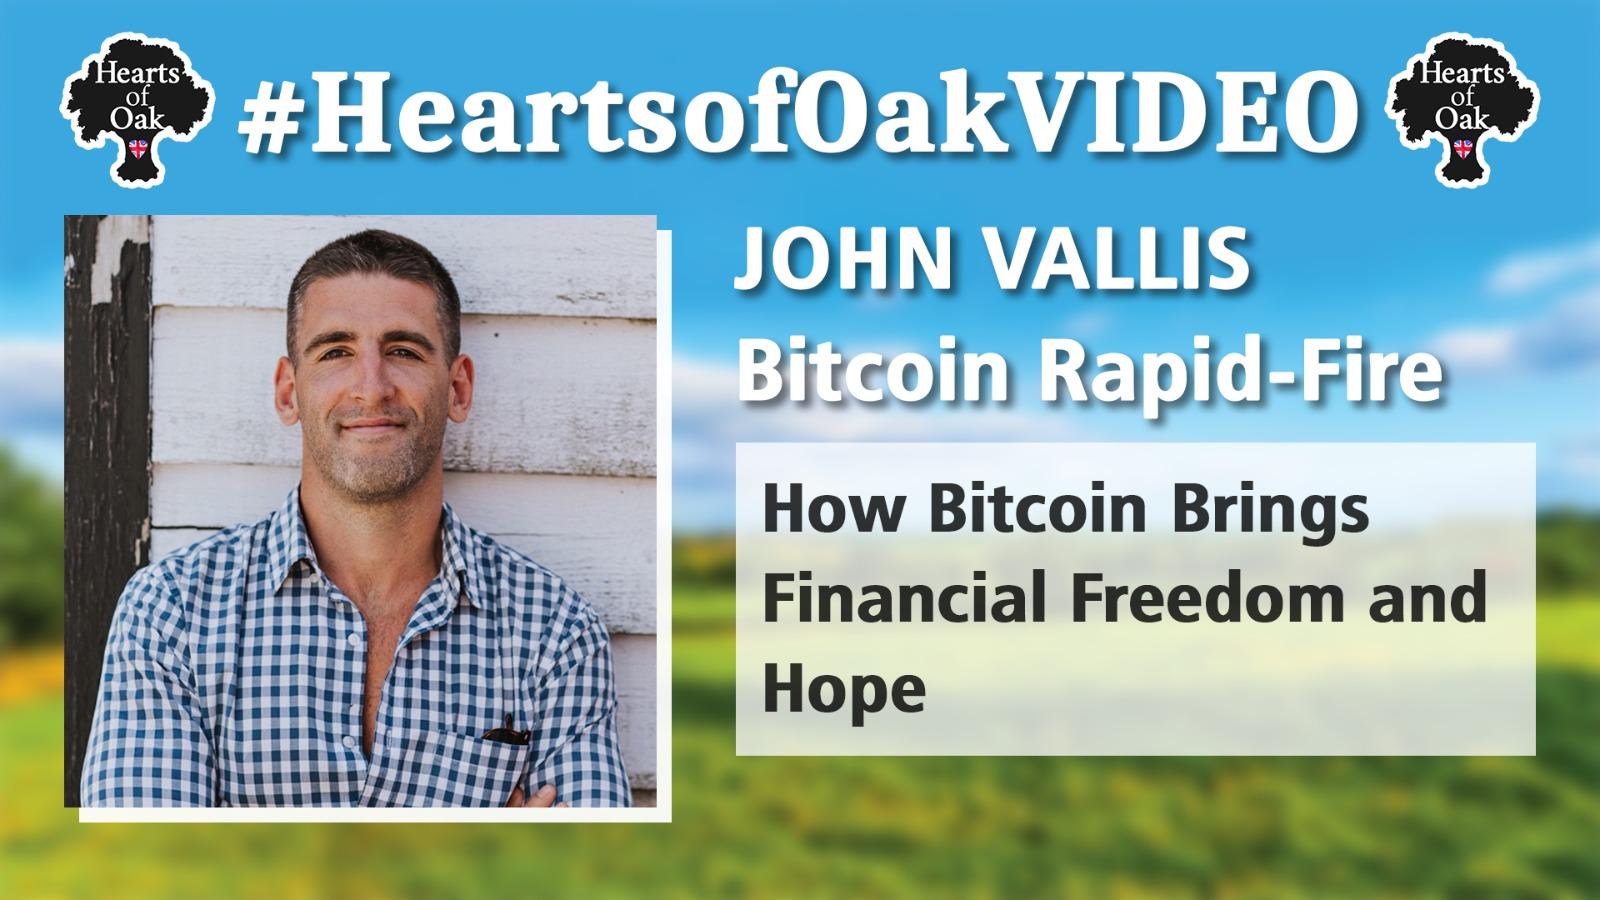 John Vallis: Bitcoin Rapid-Fire. How Bitcoin Brings Financial Freedom and Hope